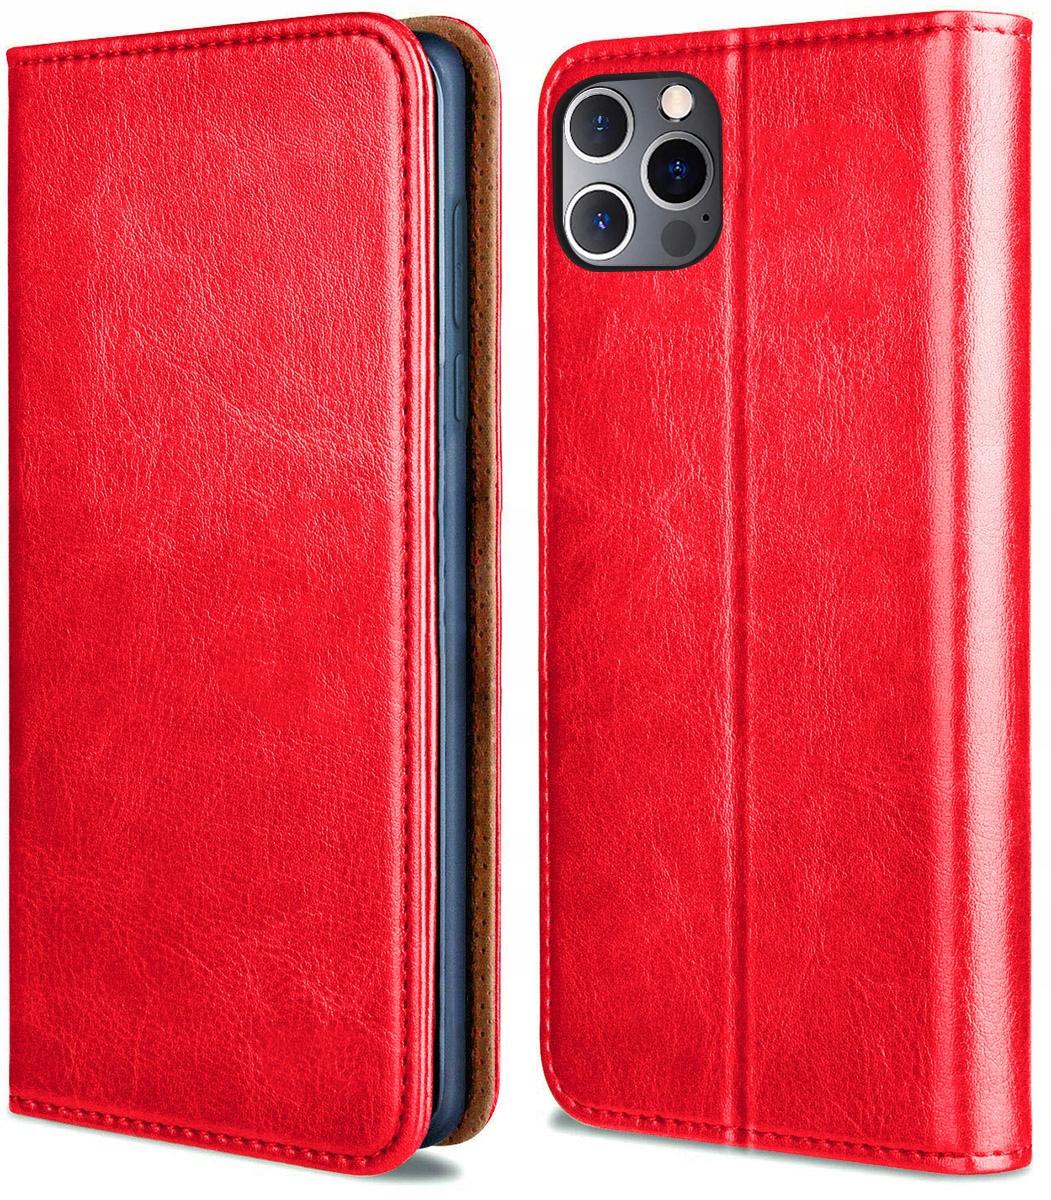 Etui do iPhone 12 Pro Skórzane Portfel + Szkło 9H